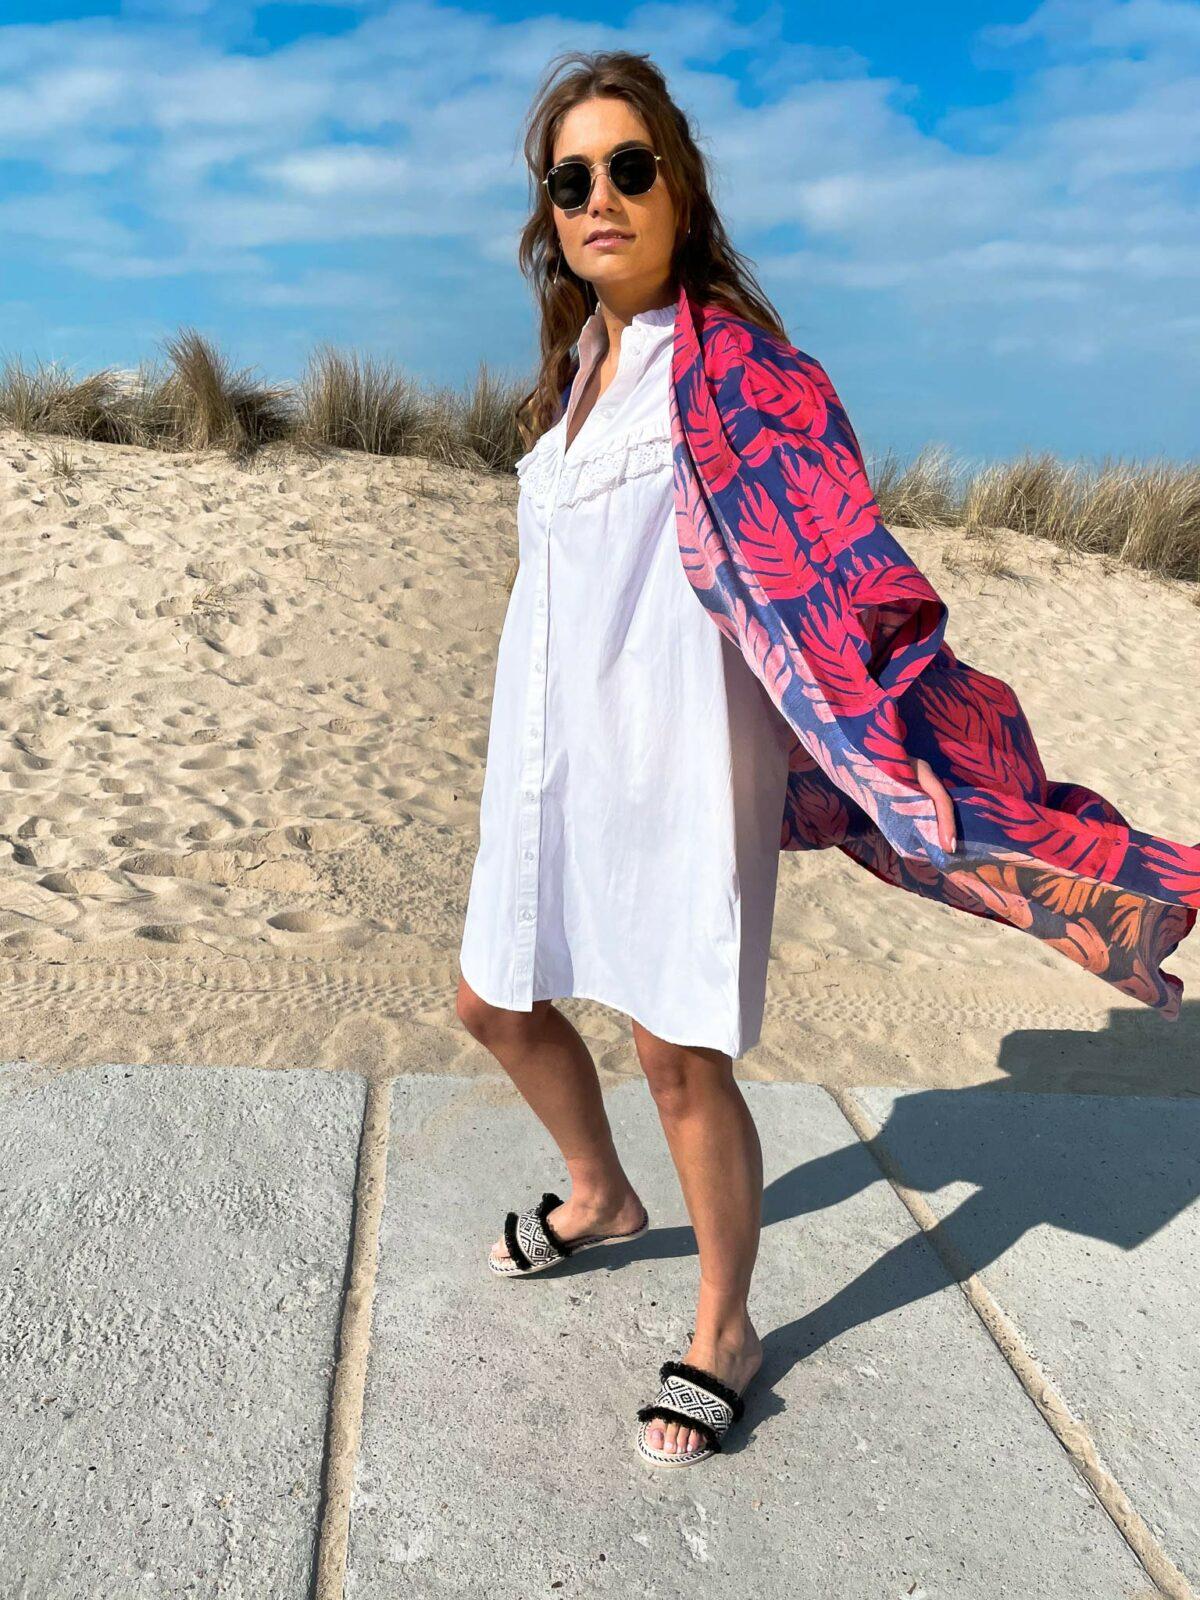 woman on the beach wearing a white dress and a fuchsia pareo